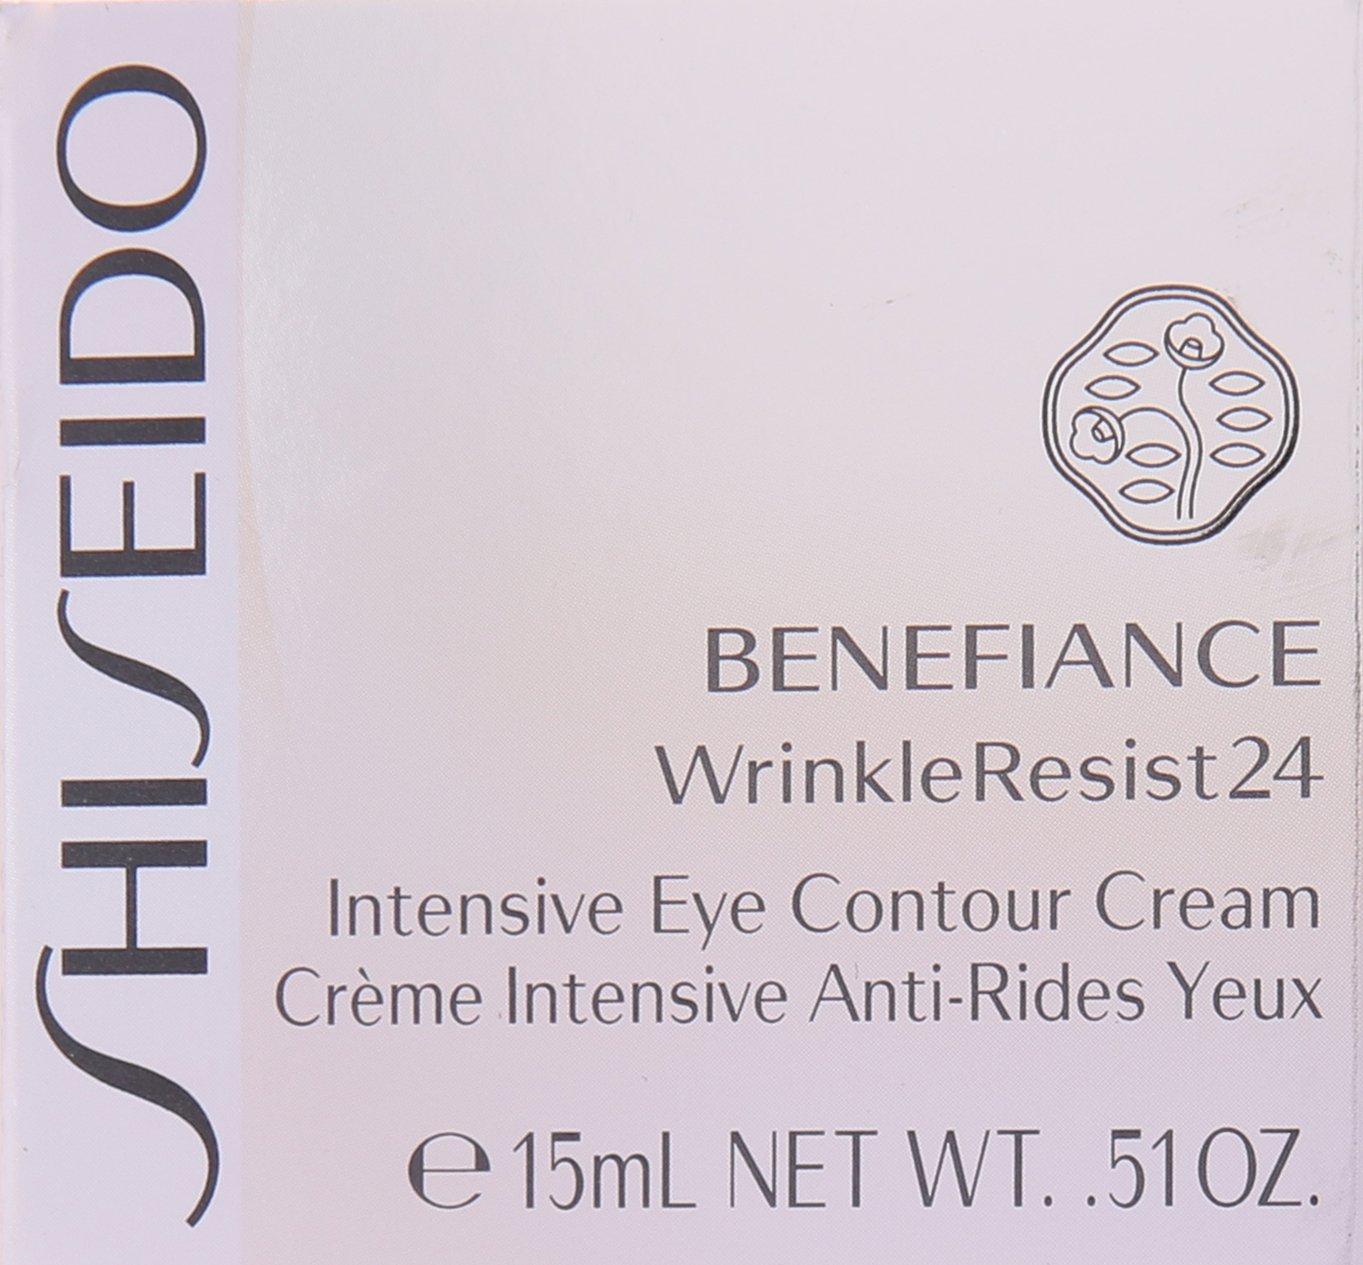 Shiseido Benefiance Wrinkle Resist24 Intensive Eye Contour Cream for Unisex, 0.51 Ounce